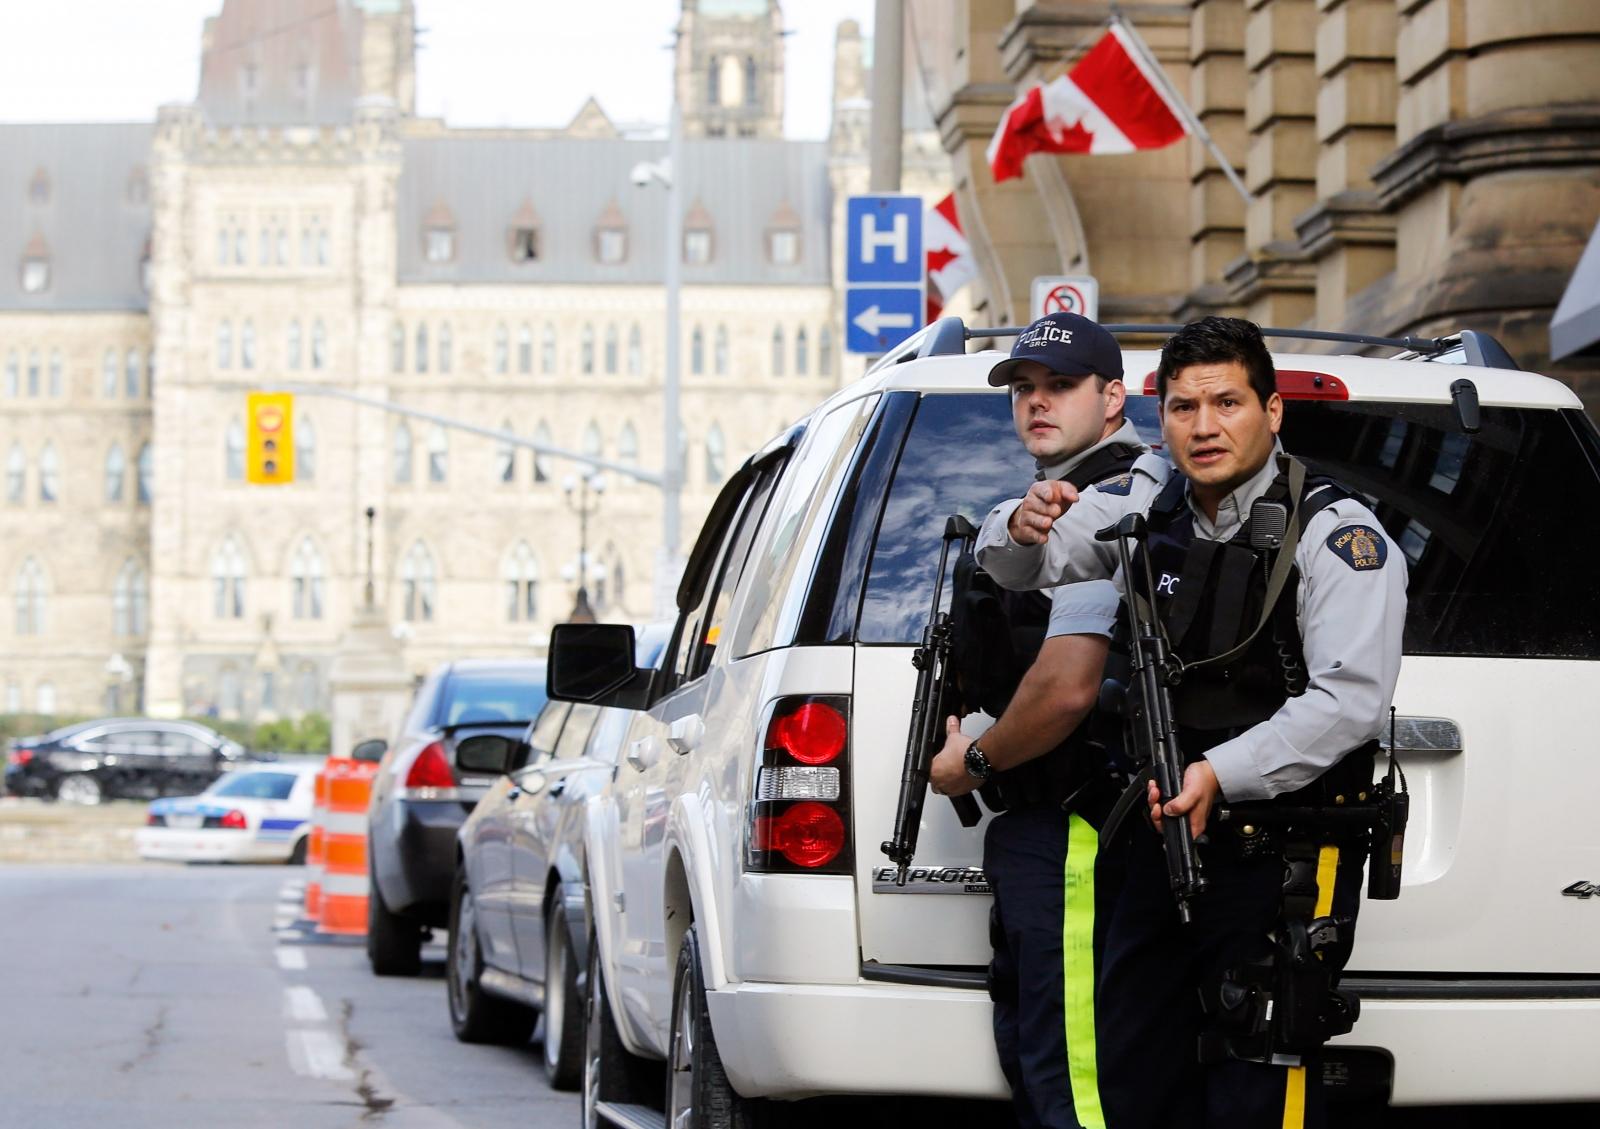 RMP officers guard Canada's parliament building in Ottawa. (Reuters)